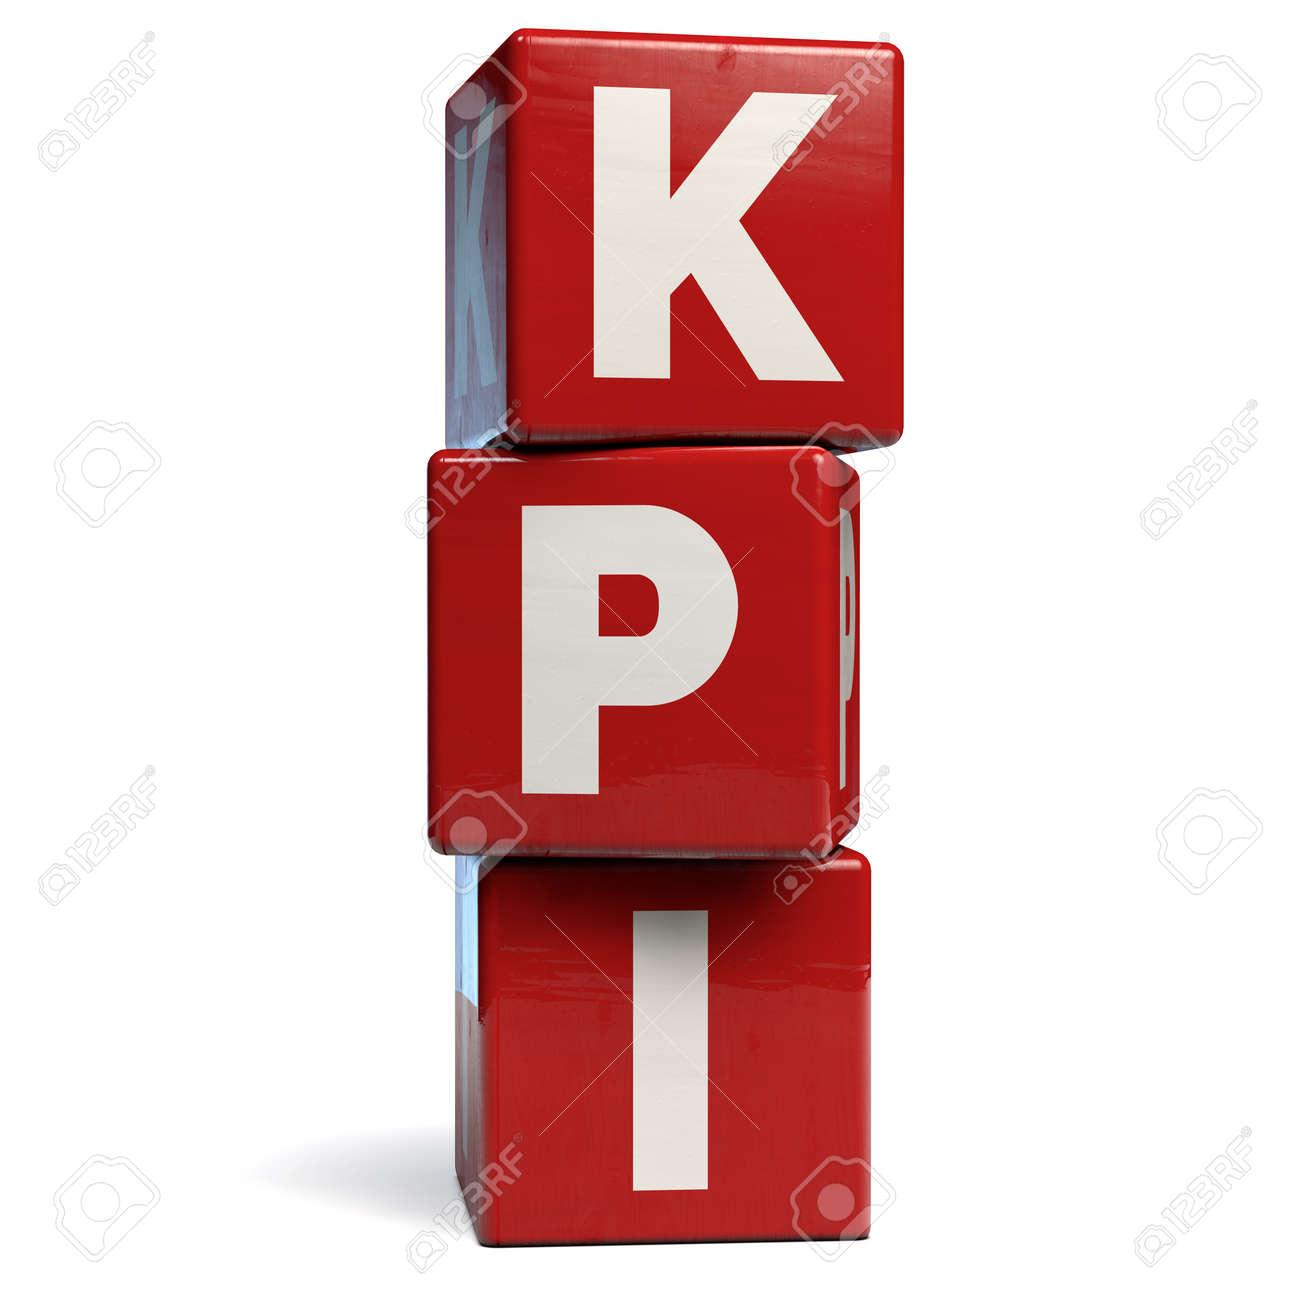 KPI Key Performance Indicators Business Acronym. 3D Illustration. - 141328977